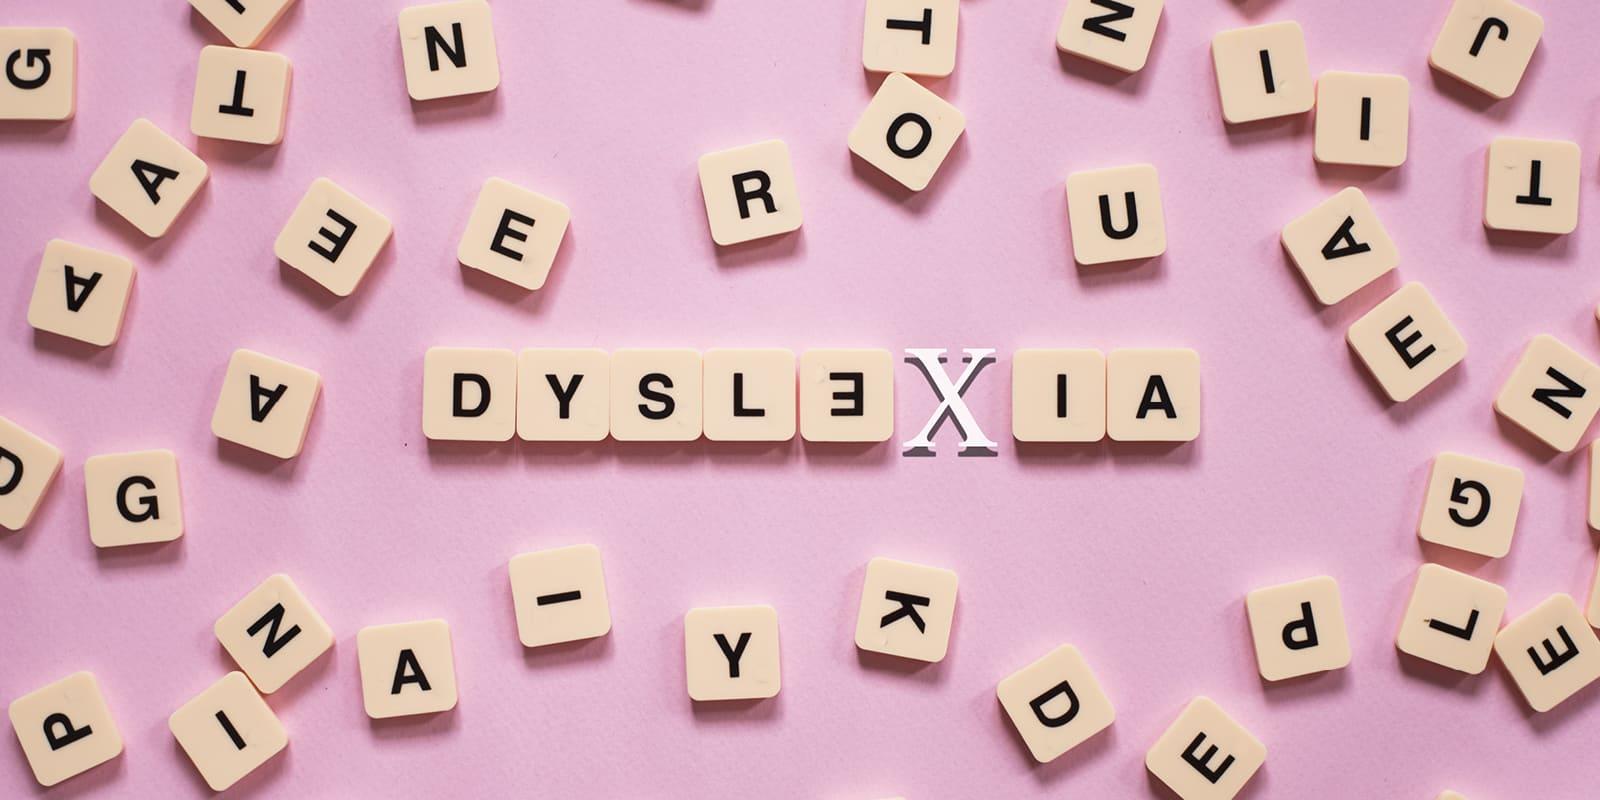 Dyslexia or Vision Problems